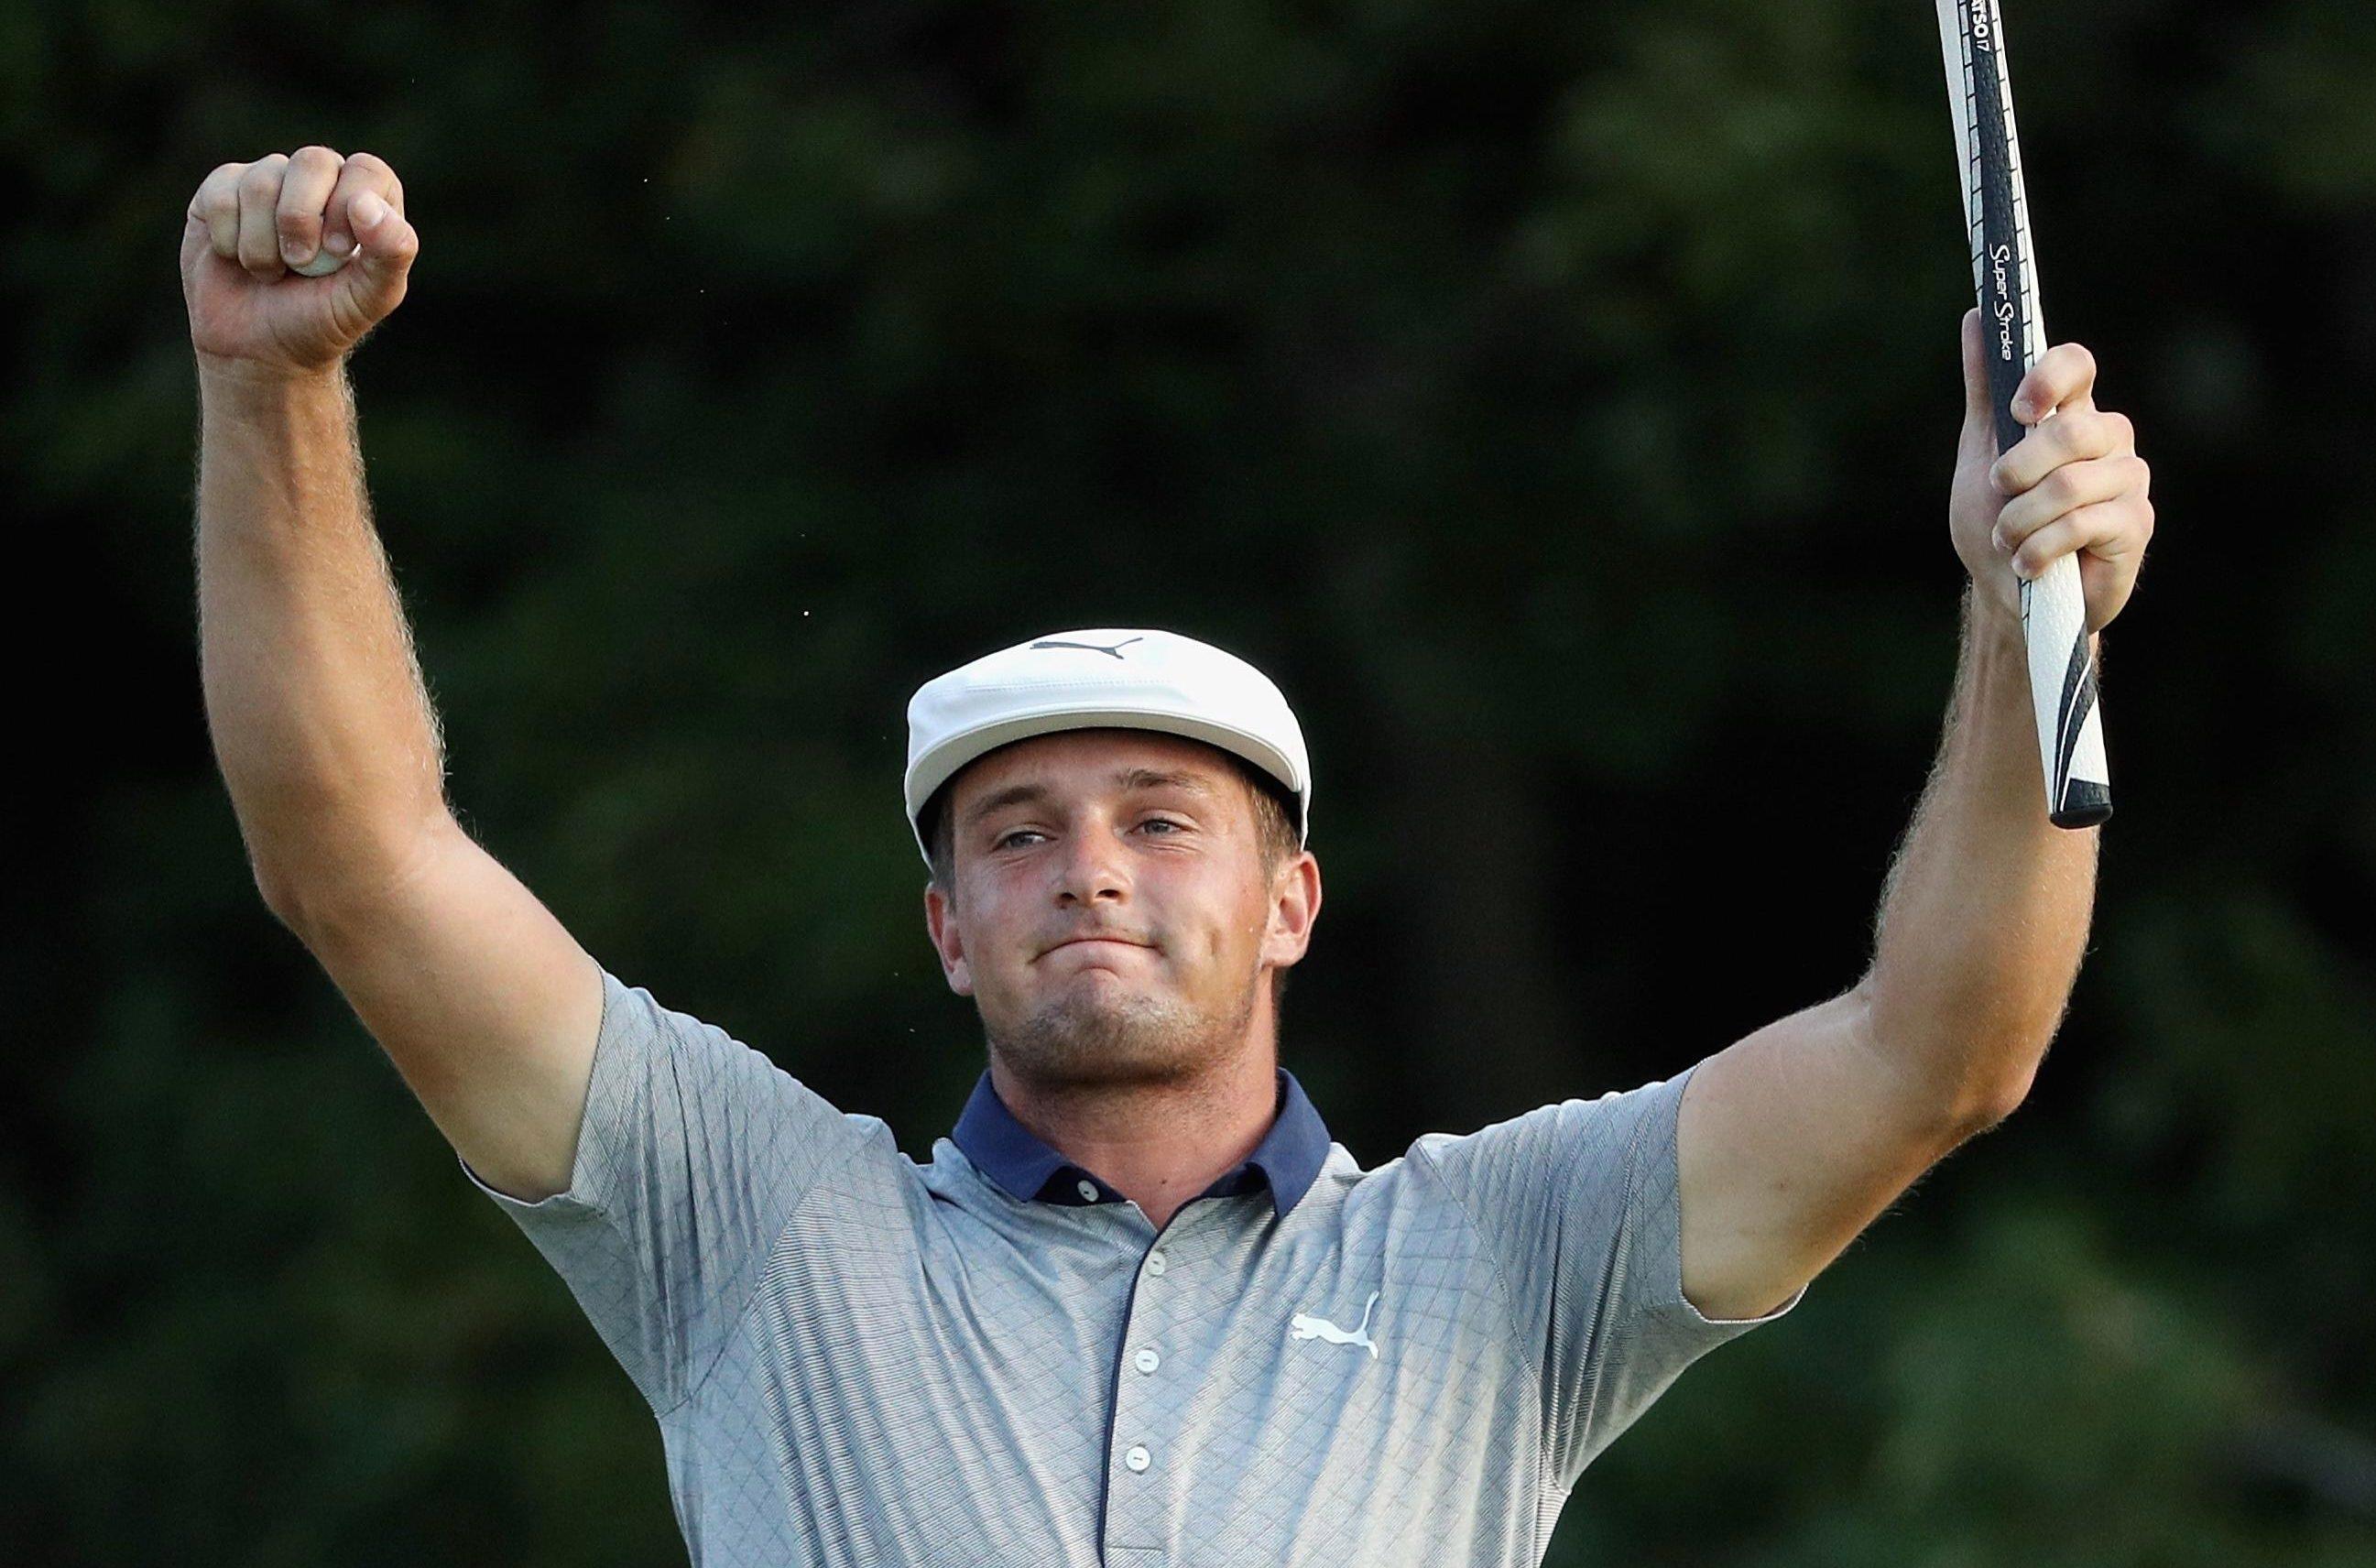 Bryson DeChambeau has won four PGA titles in 14 months